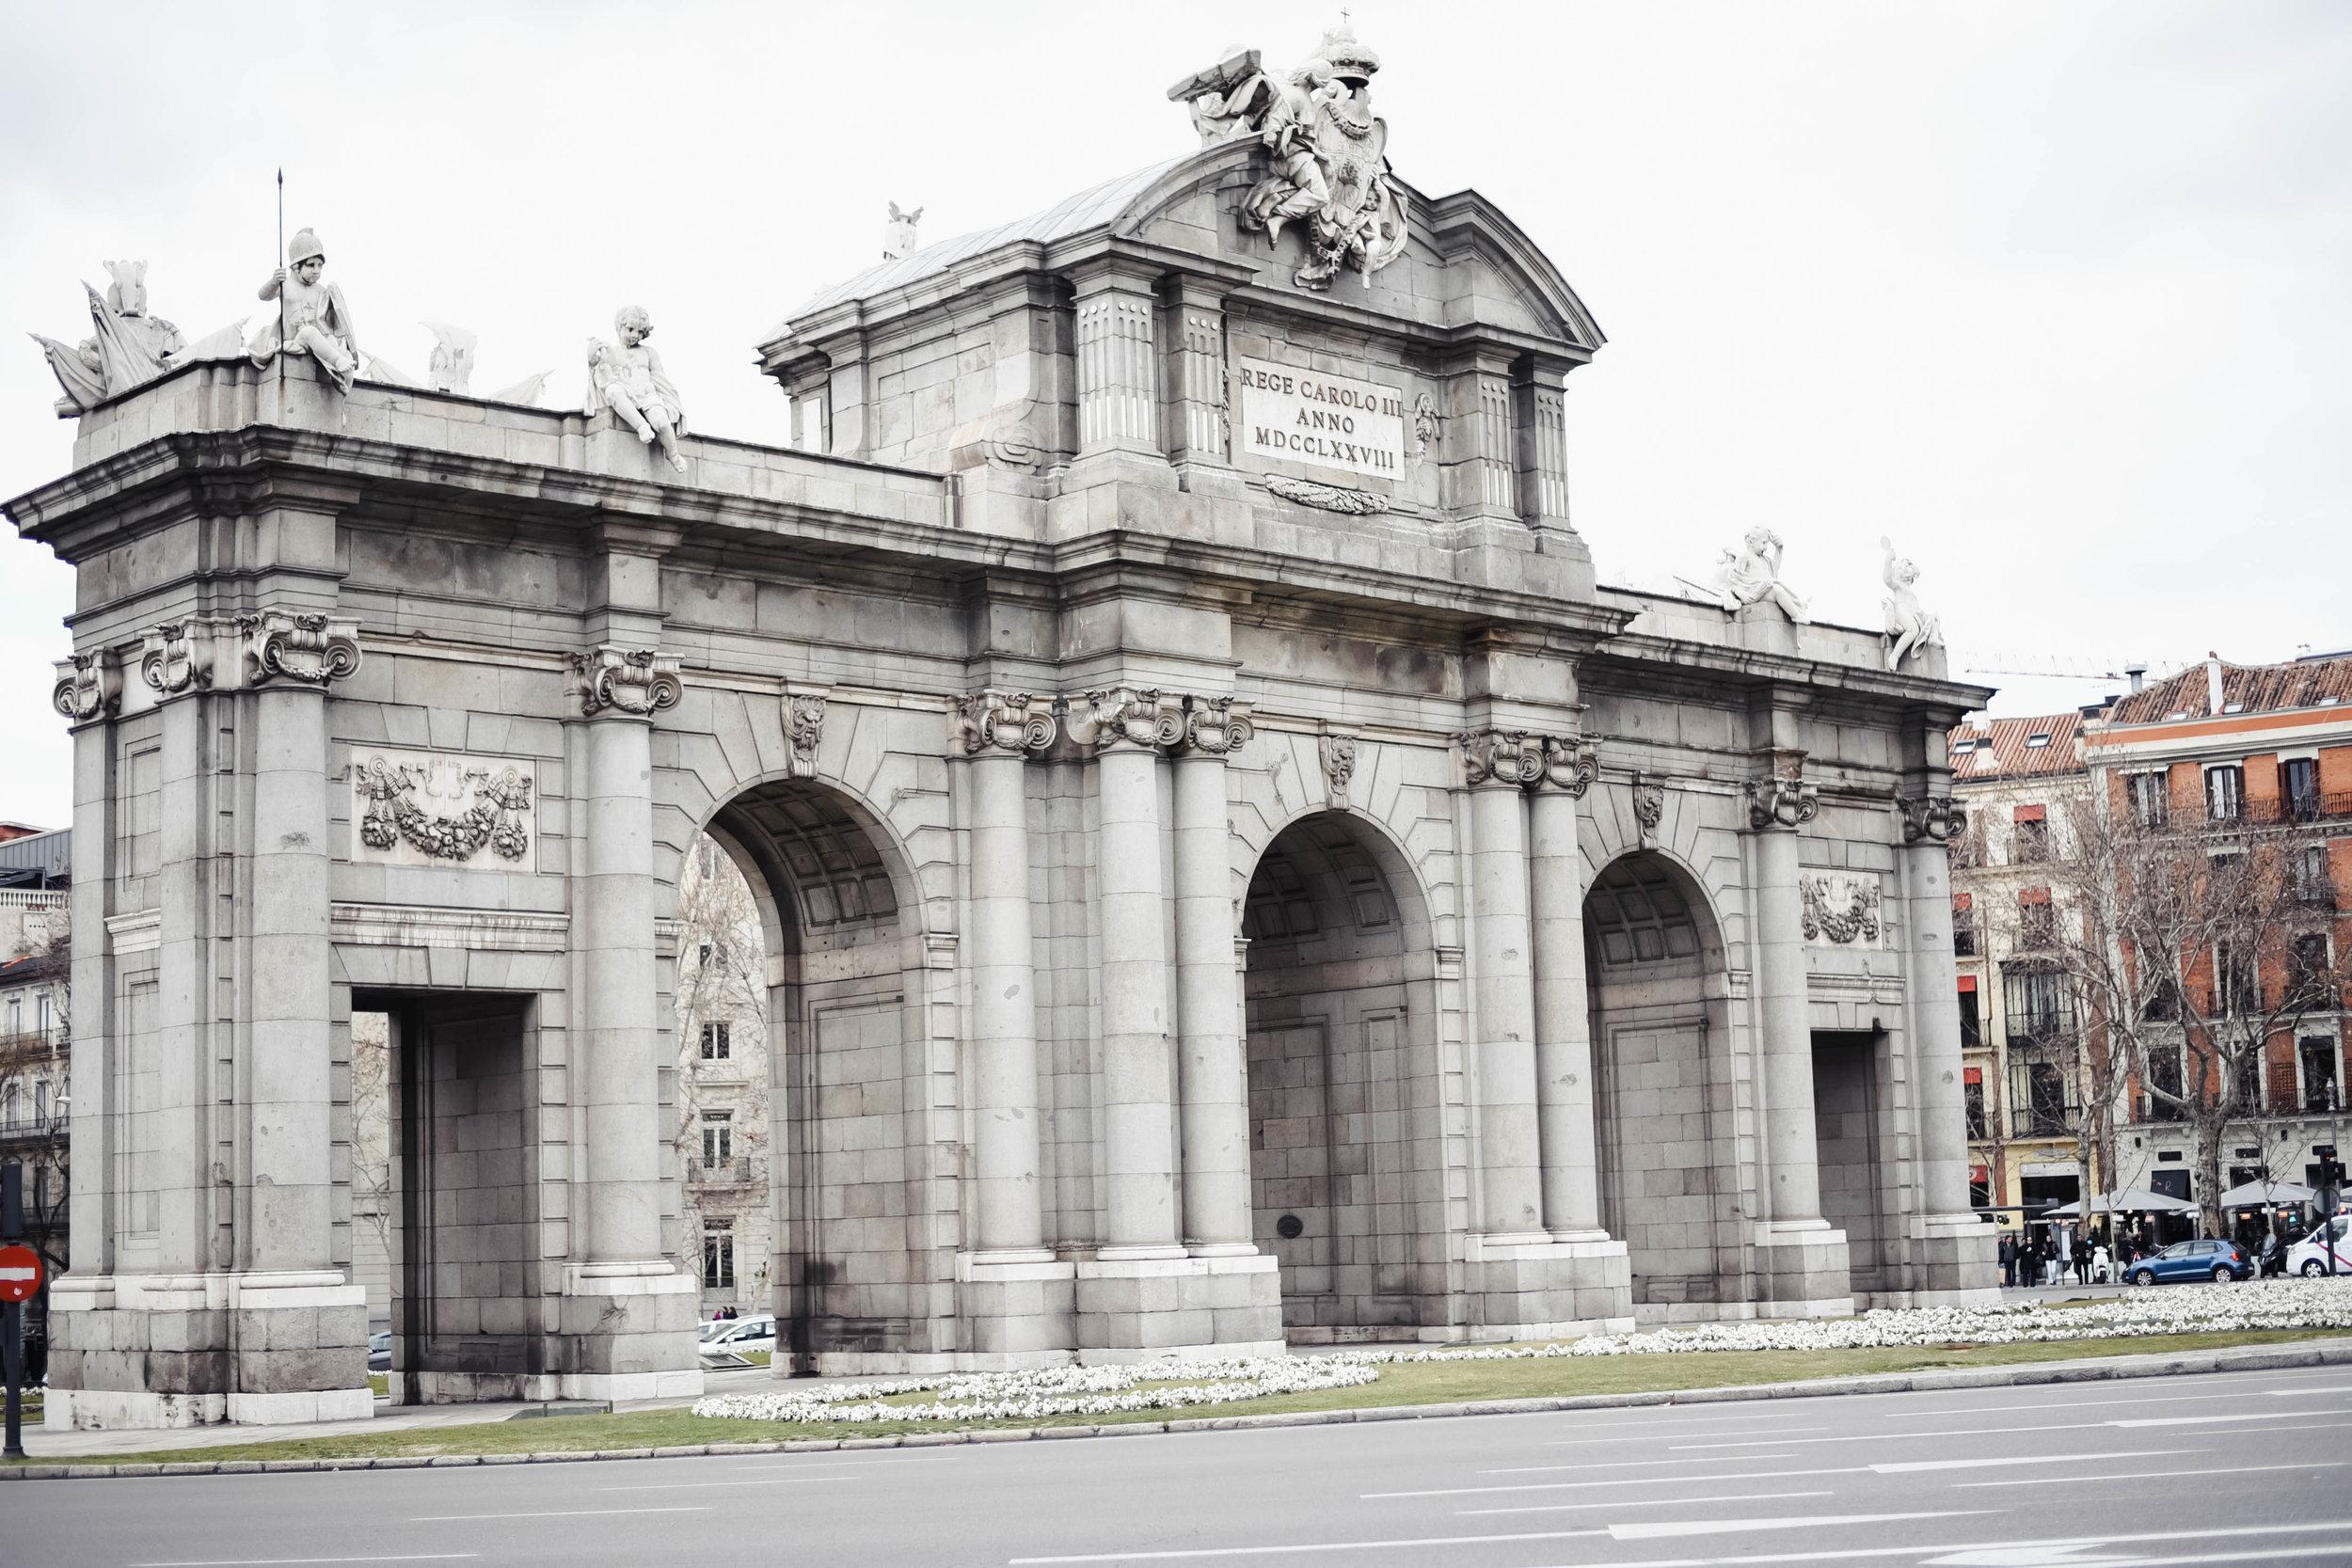 Puerta de Alcalá, Madrid, Spain © 2018 Nidia Serrano